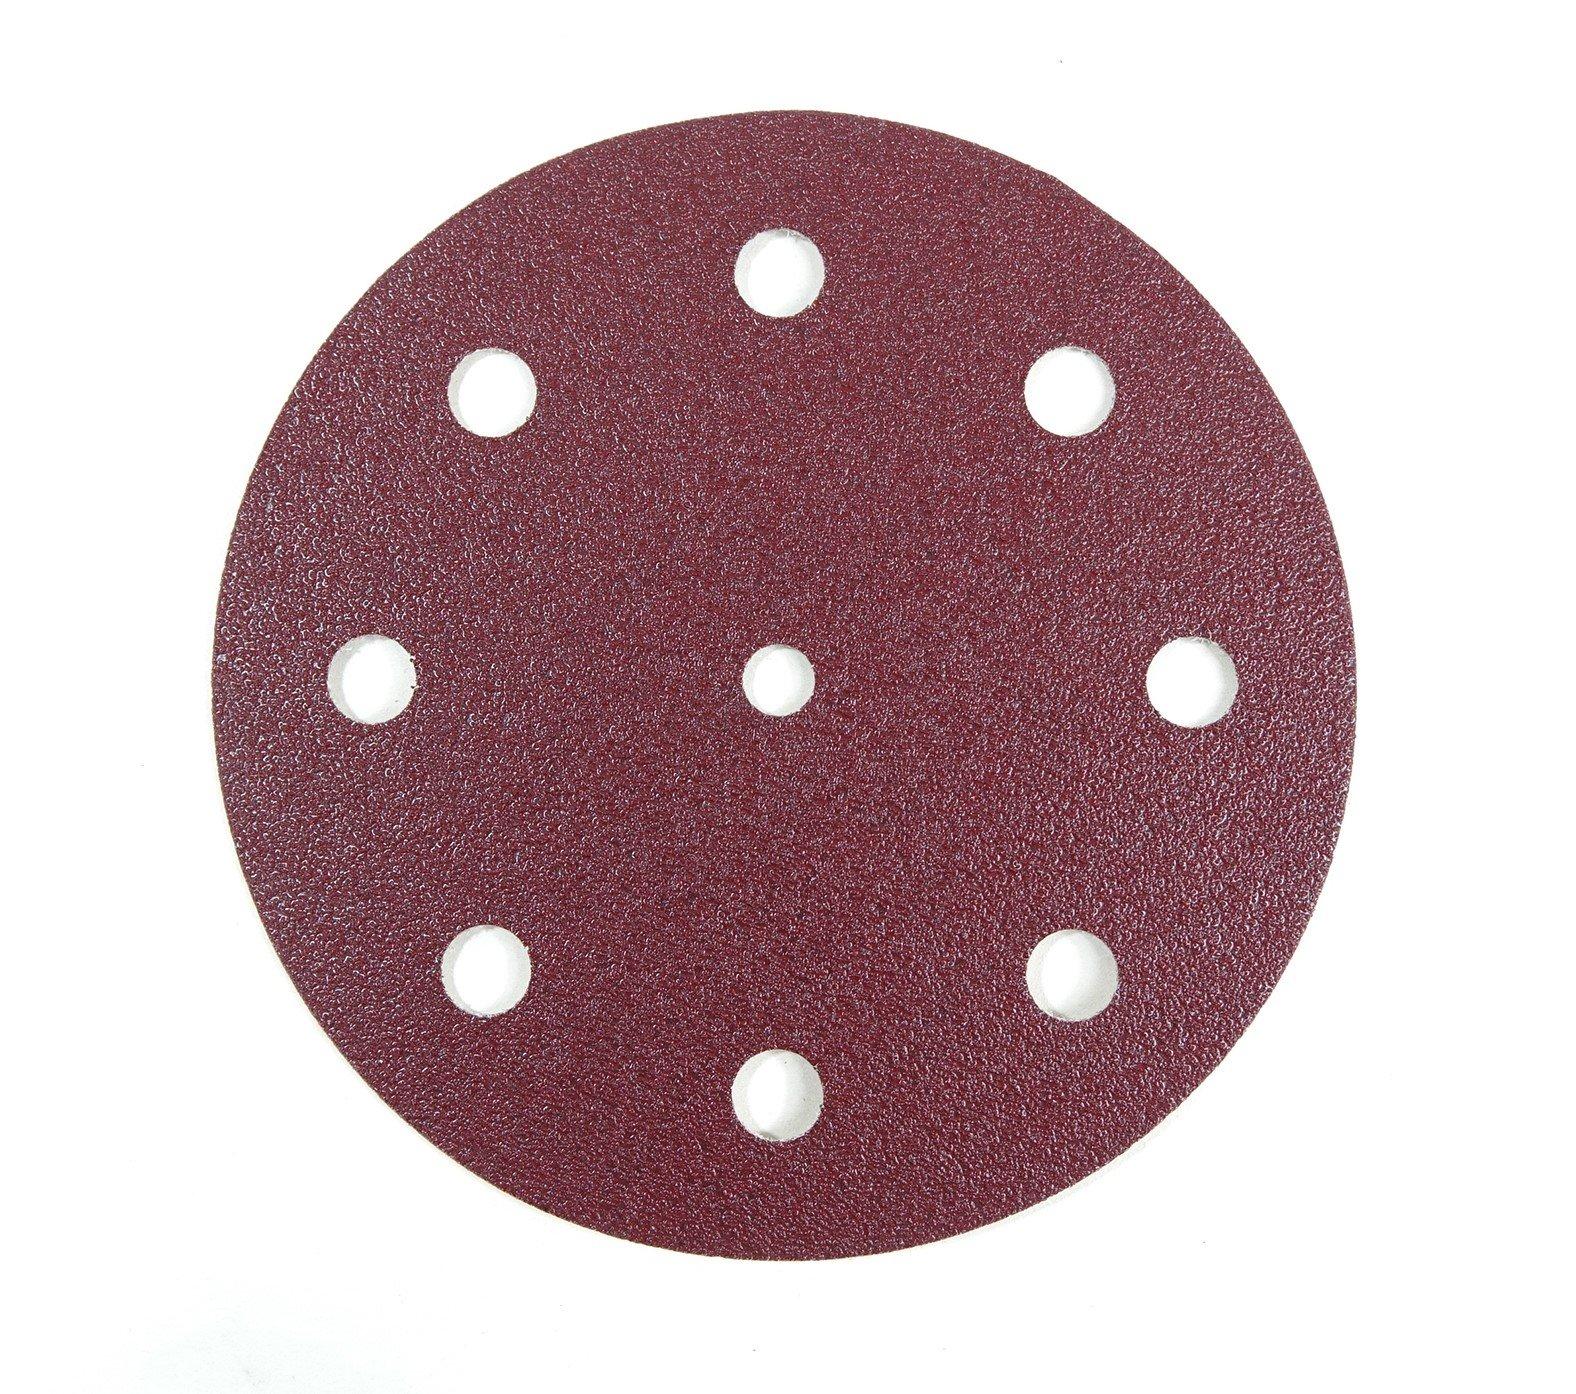 "POWERTEC 240 Grit Sanding Disc | Red | Hook and Loop 5"" Sanding Discs Abrasives for RO 125 Festool Sander – 50 Pack"